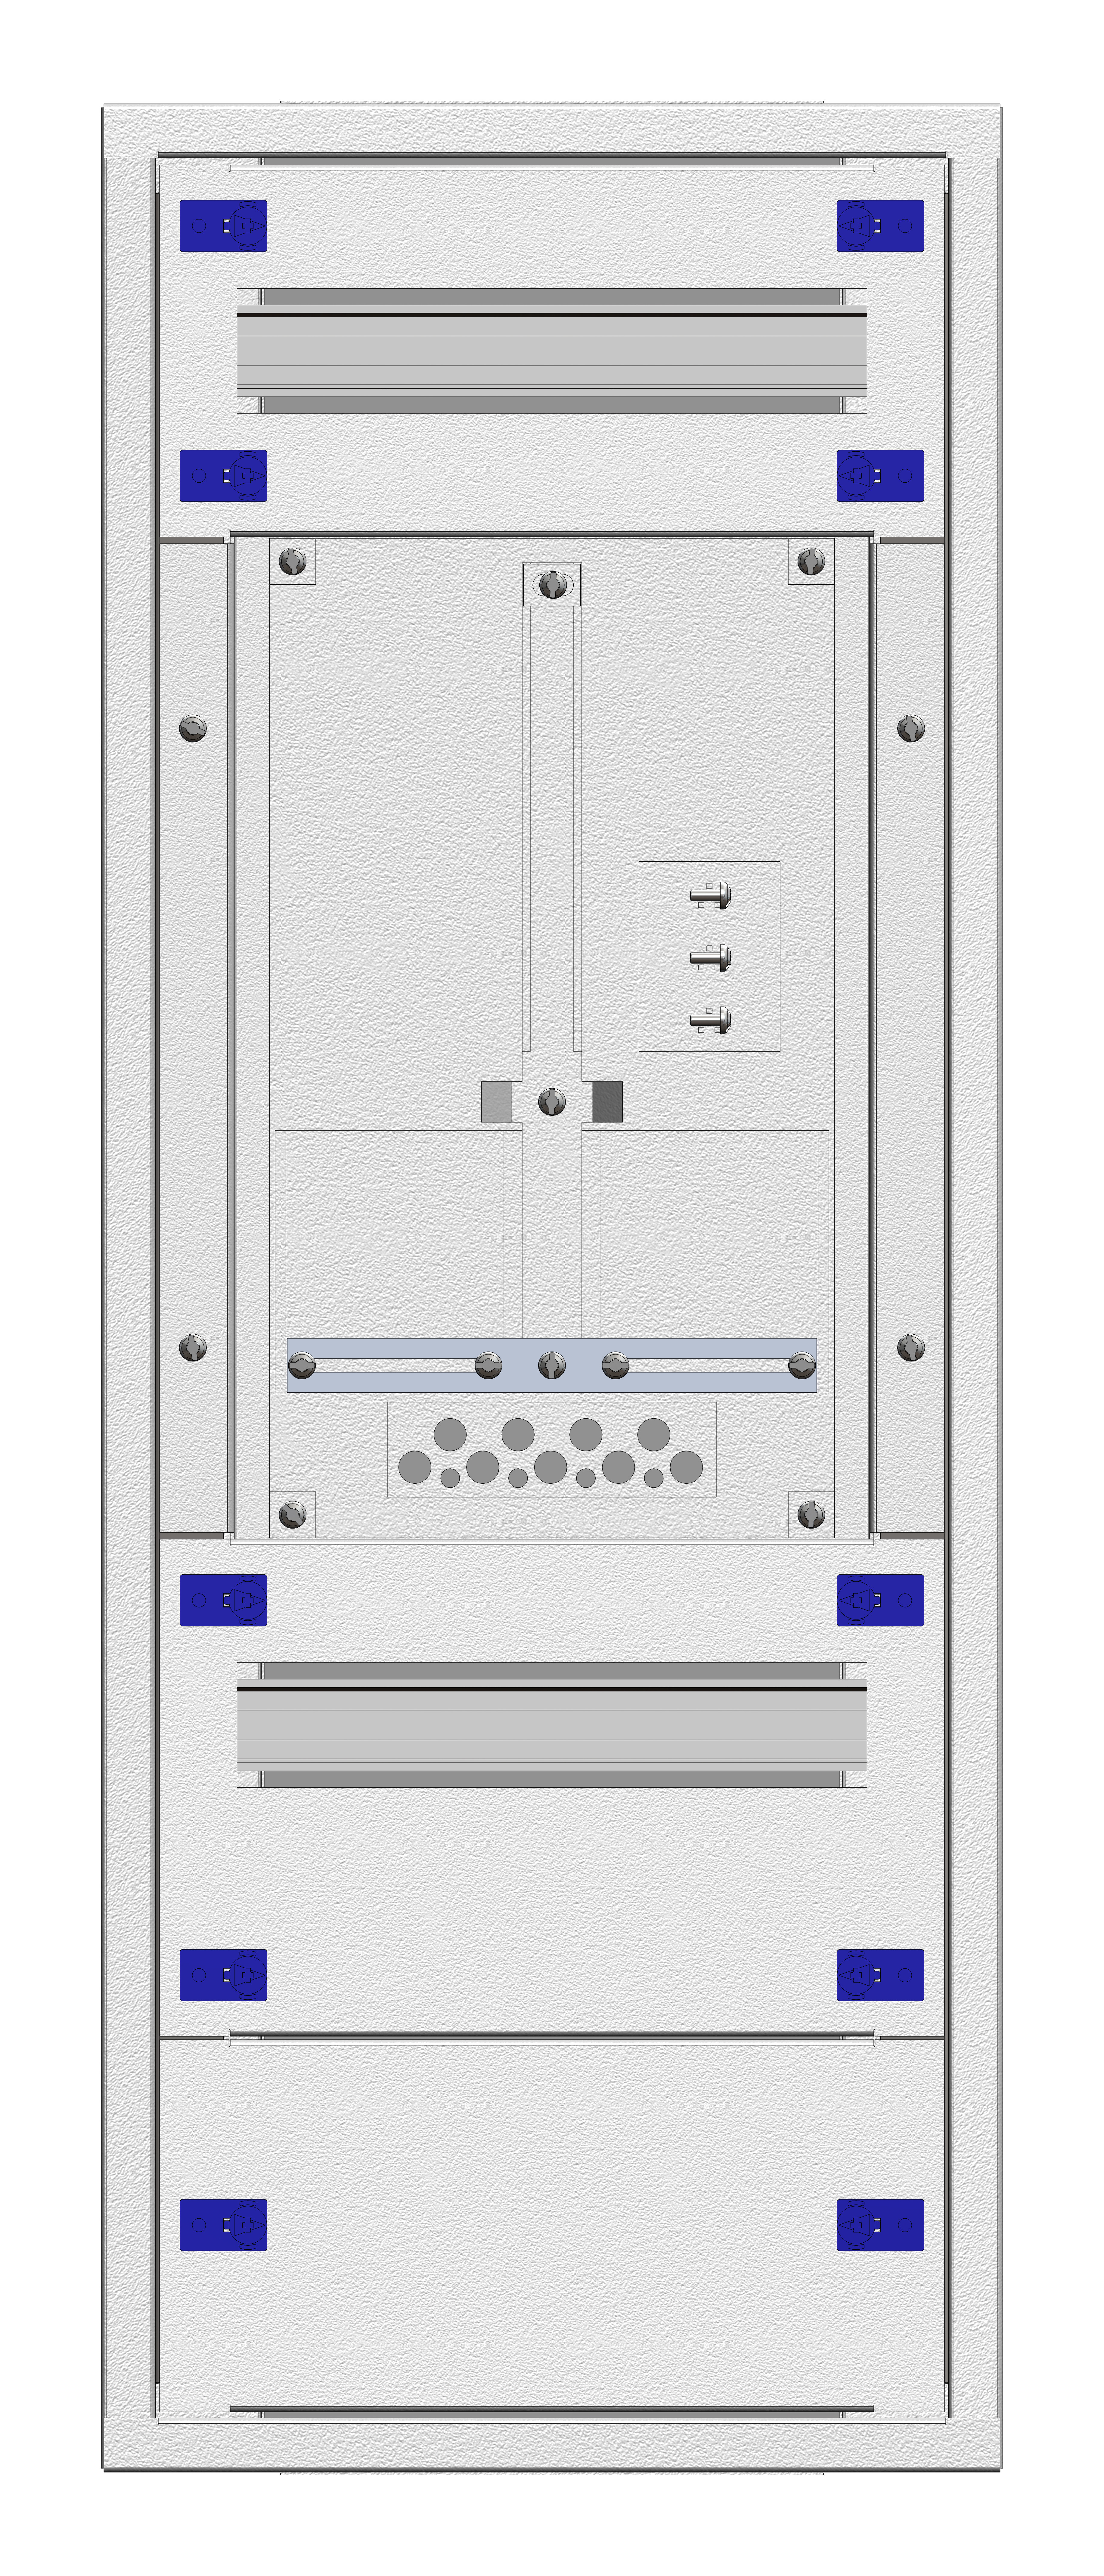 1 Stk Aufputz-Zählerverteiler 1A-18E/OOE 1ZP, H915B380T250mm IL160118OS